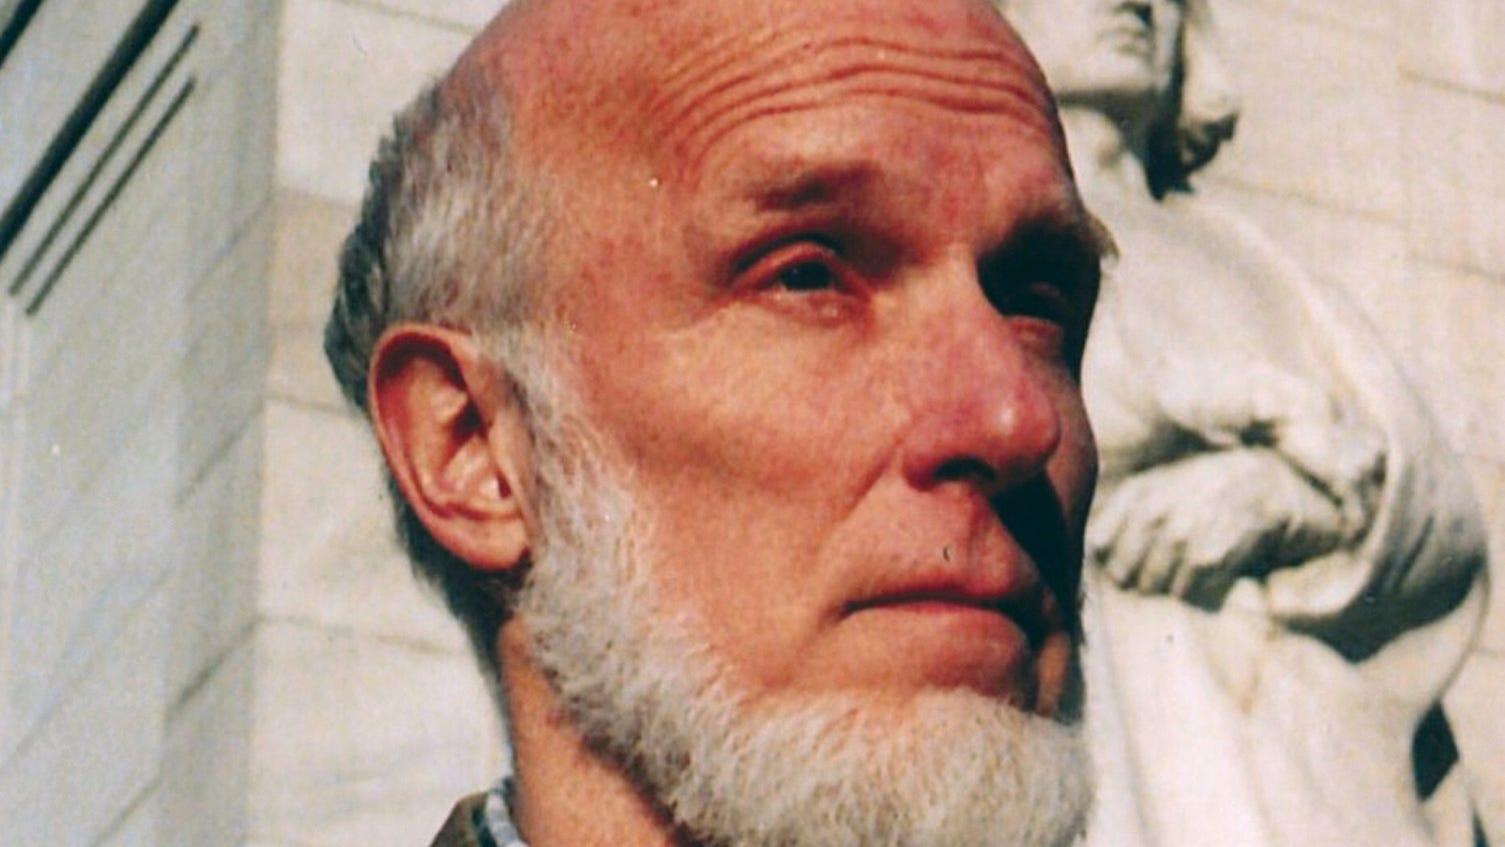 www.detroitnews.com: James W. Loewen, who wrote 'Lies My Teacher Told Me,' dead at 79